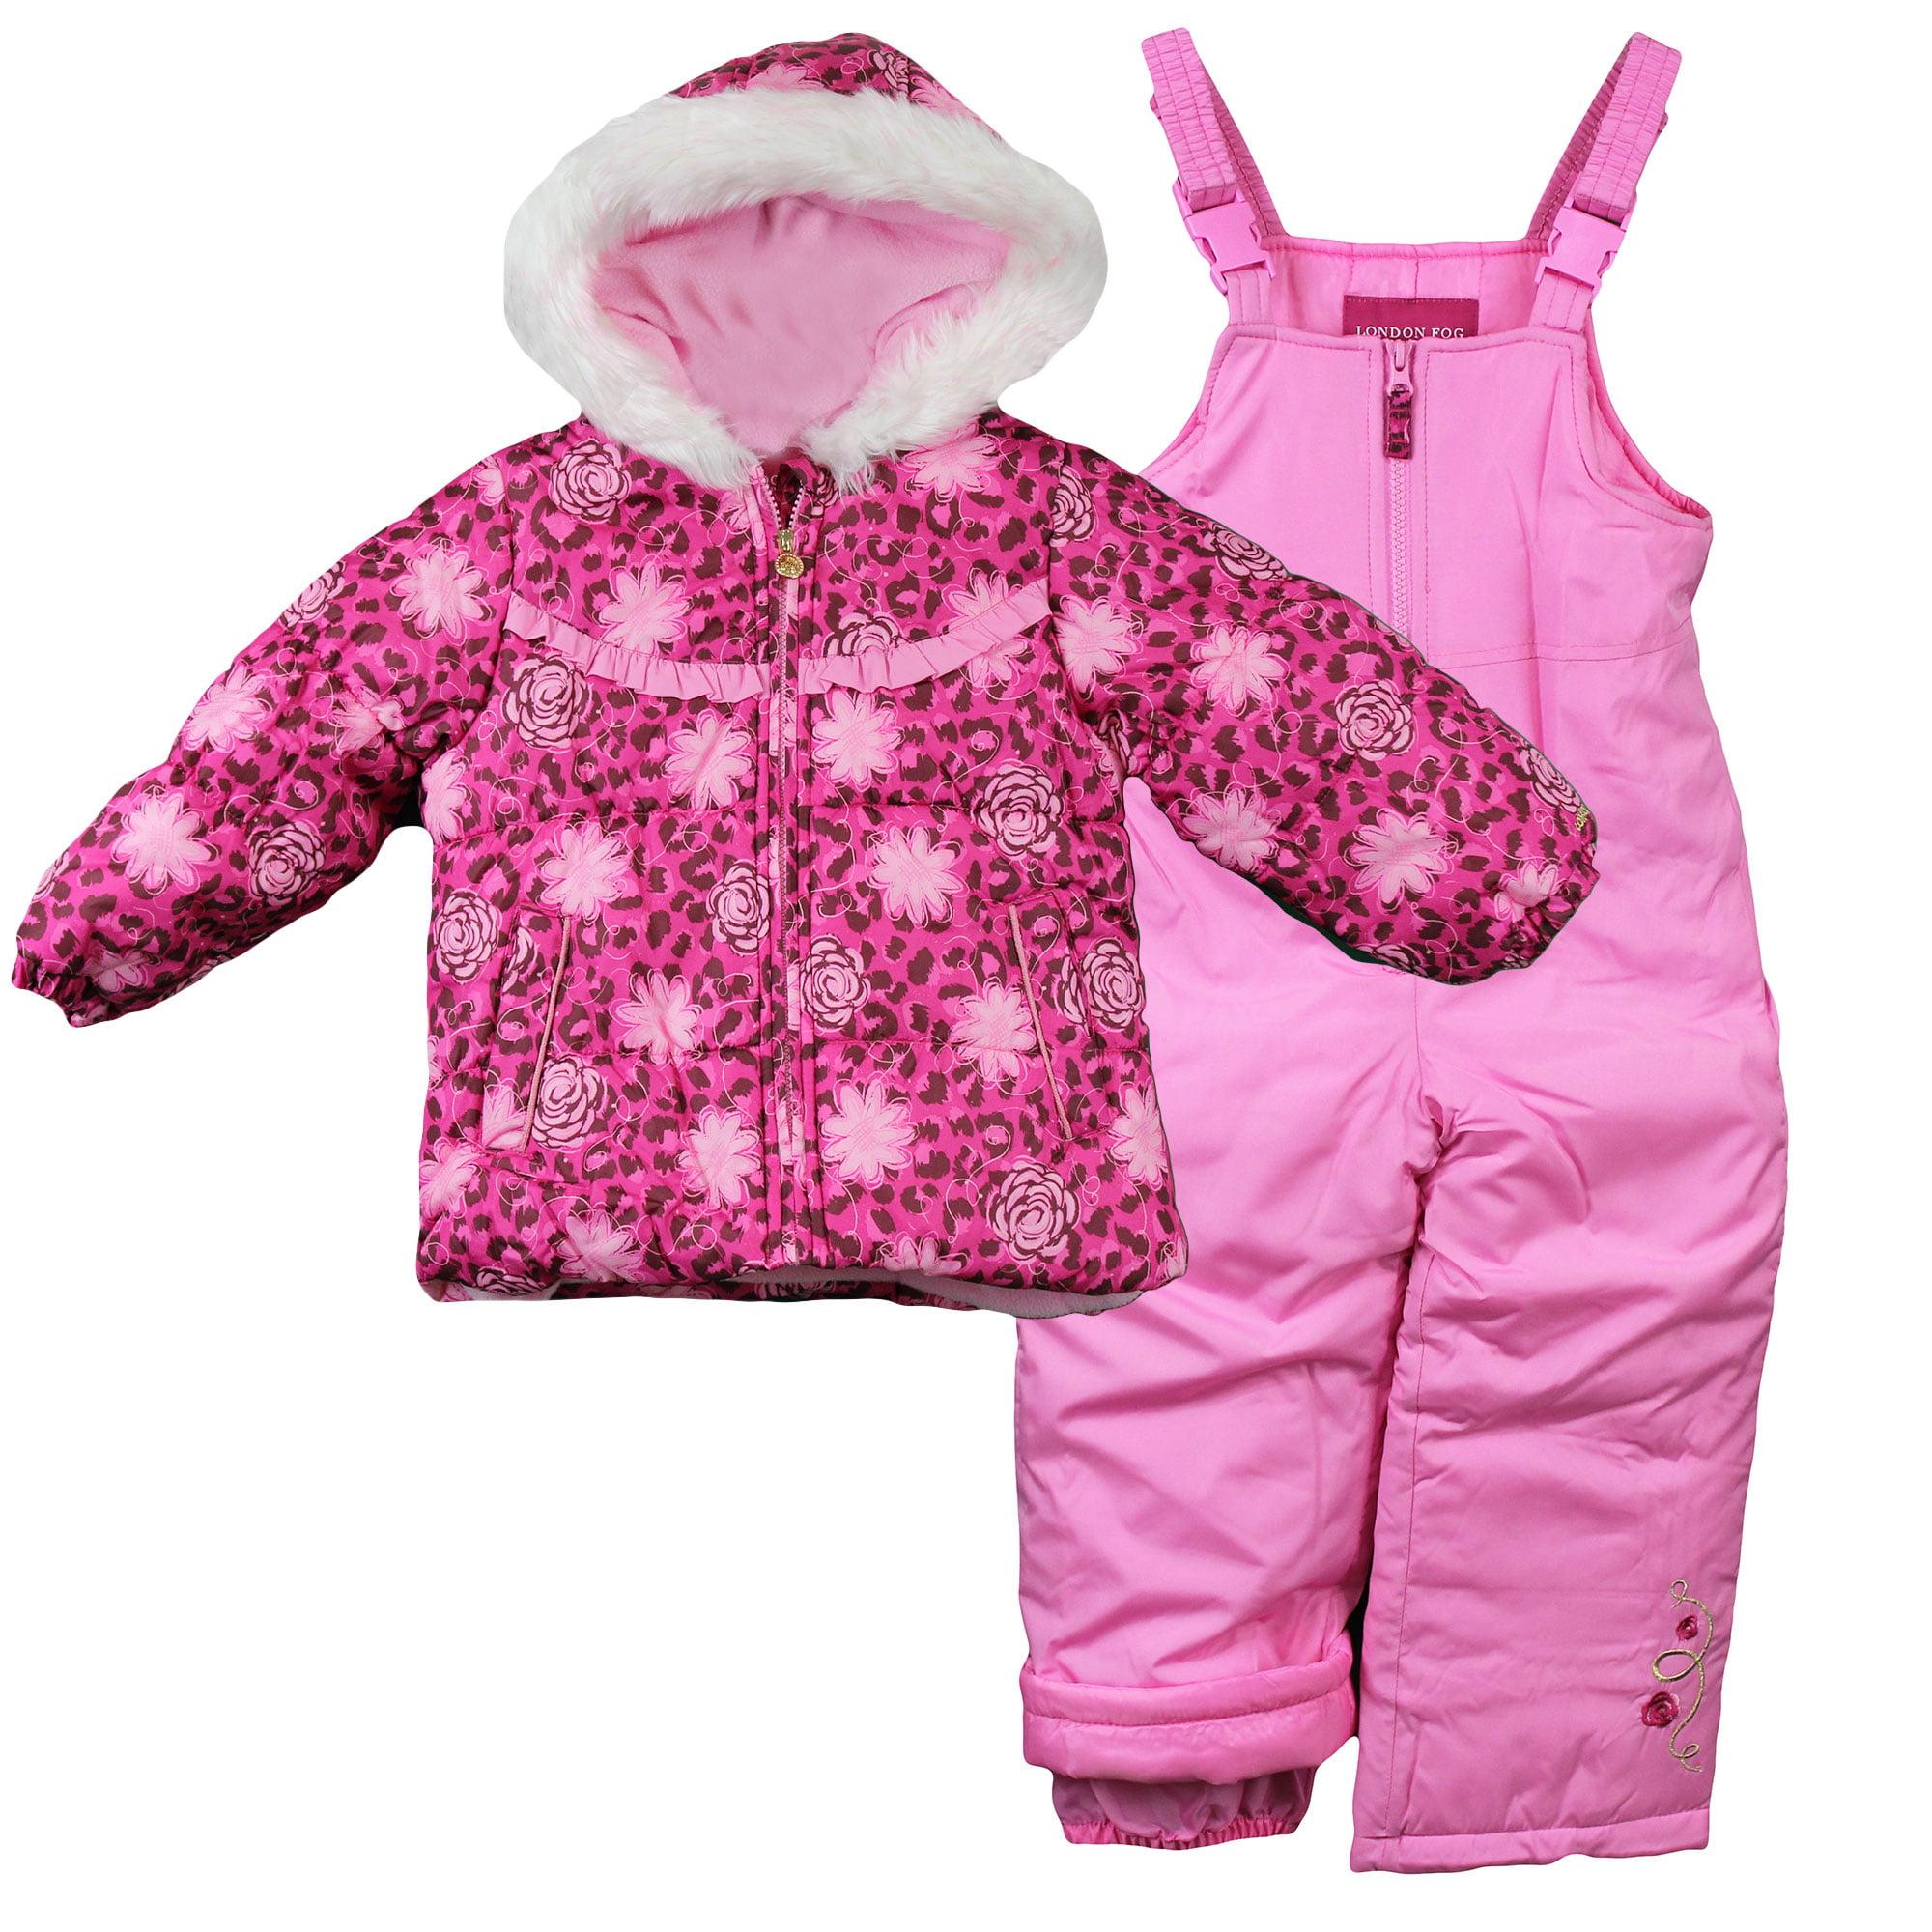 London Fog Baby Girls Winter Snowsuit Winter Jacket and S...